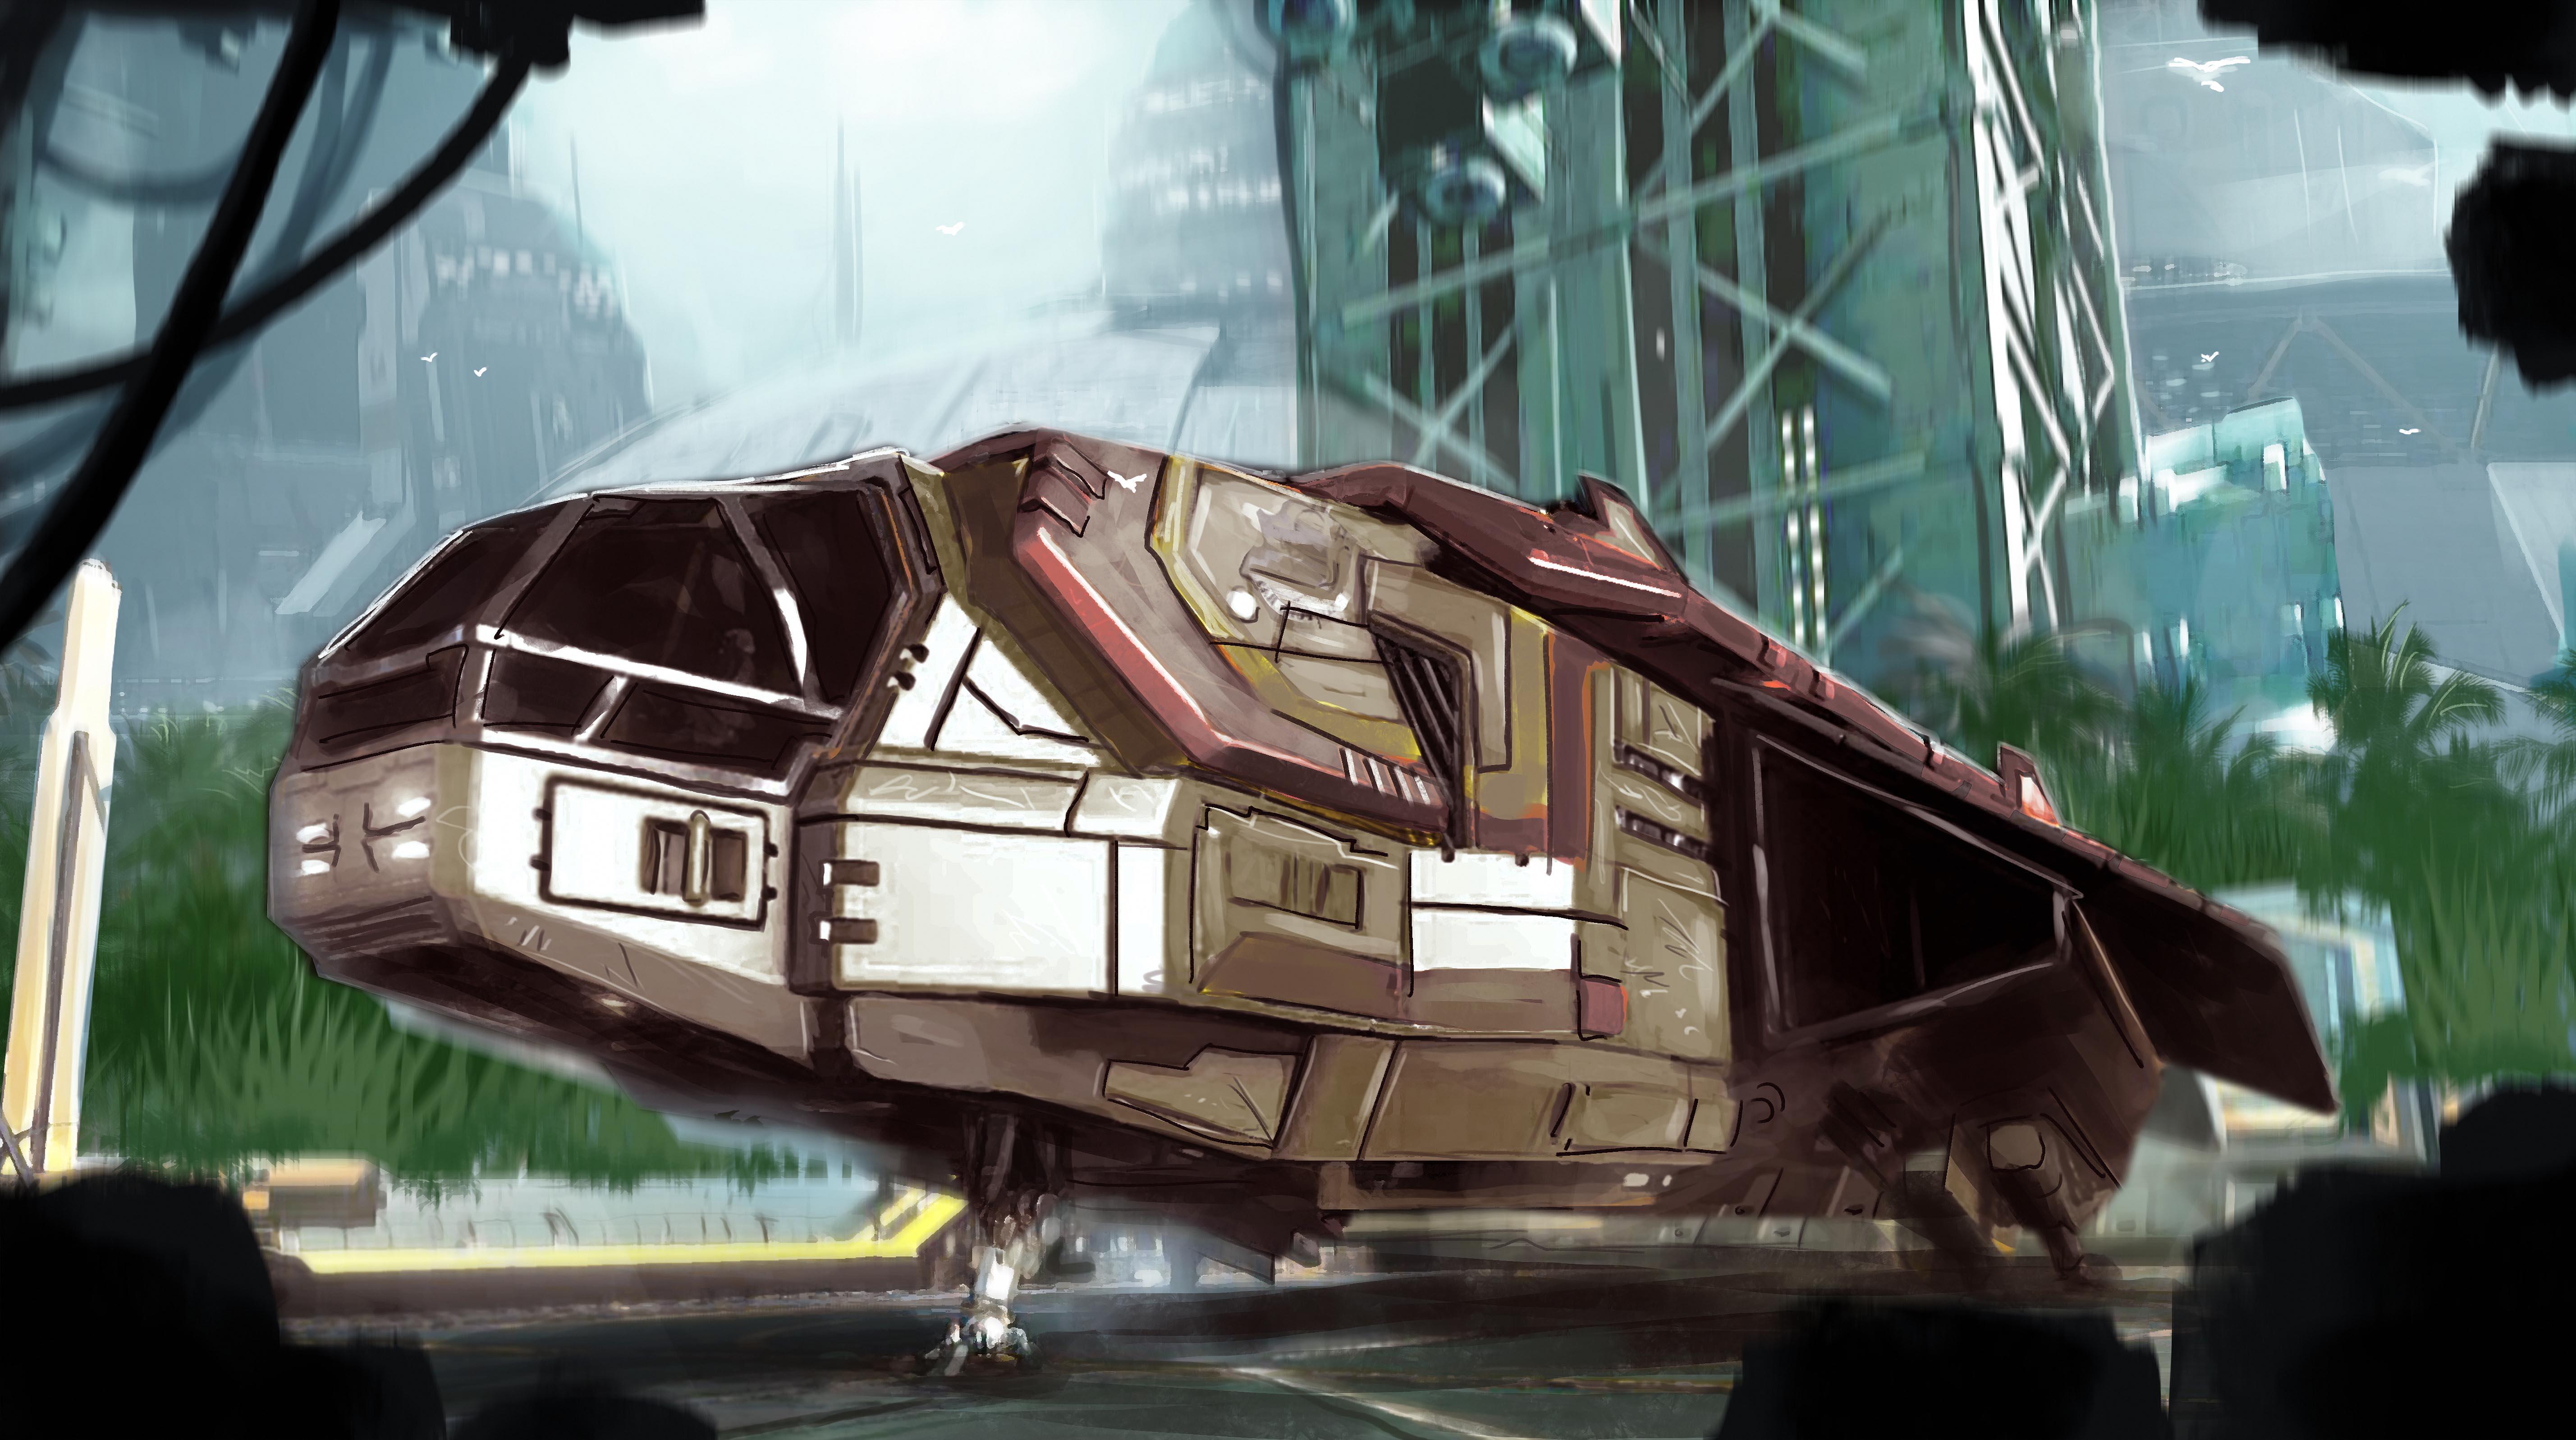 General 5714x3194 Elite: Dangerous science fiction PC gaming vehicle video game art Kev-Art